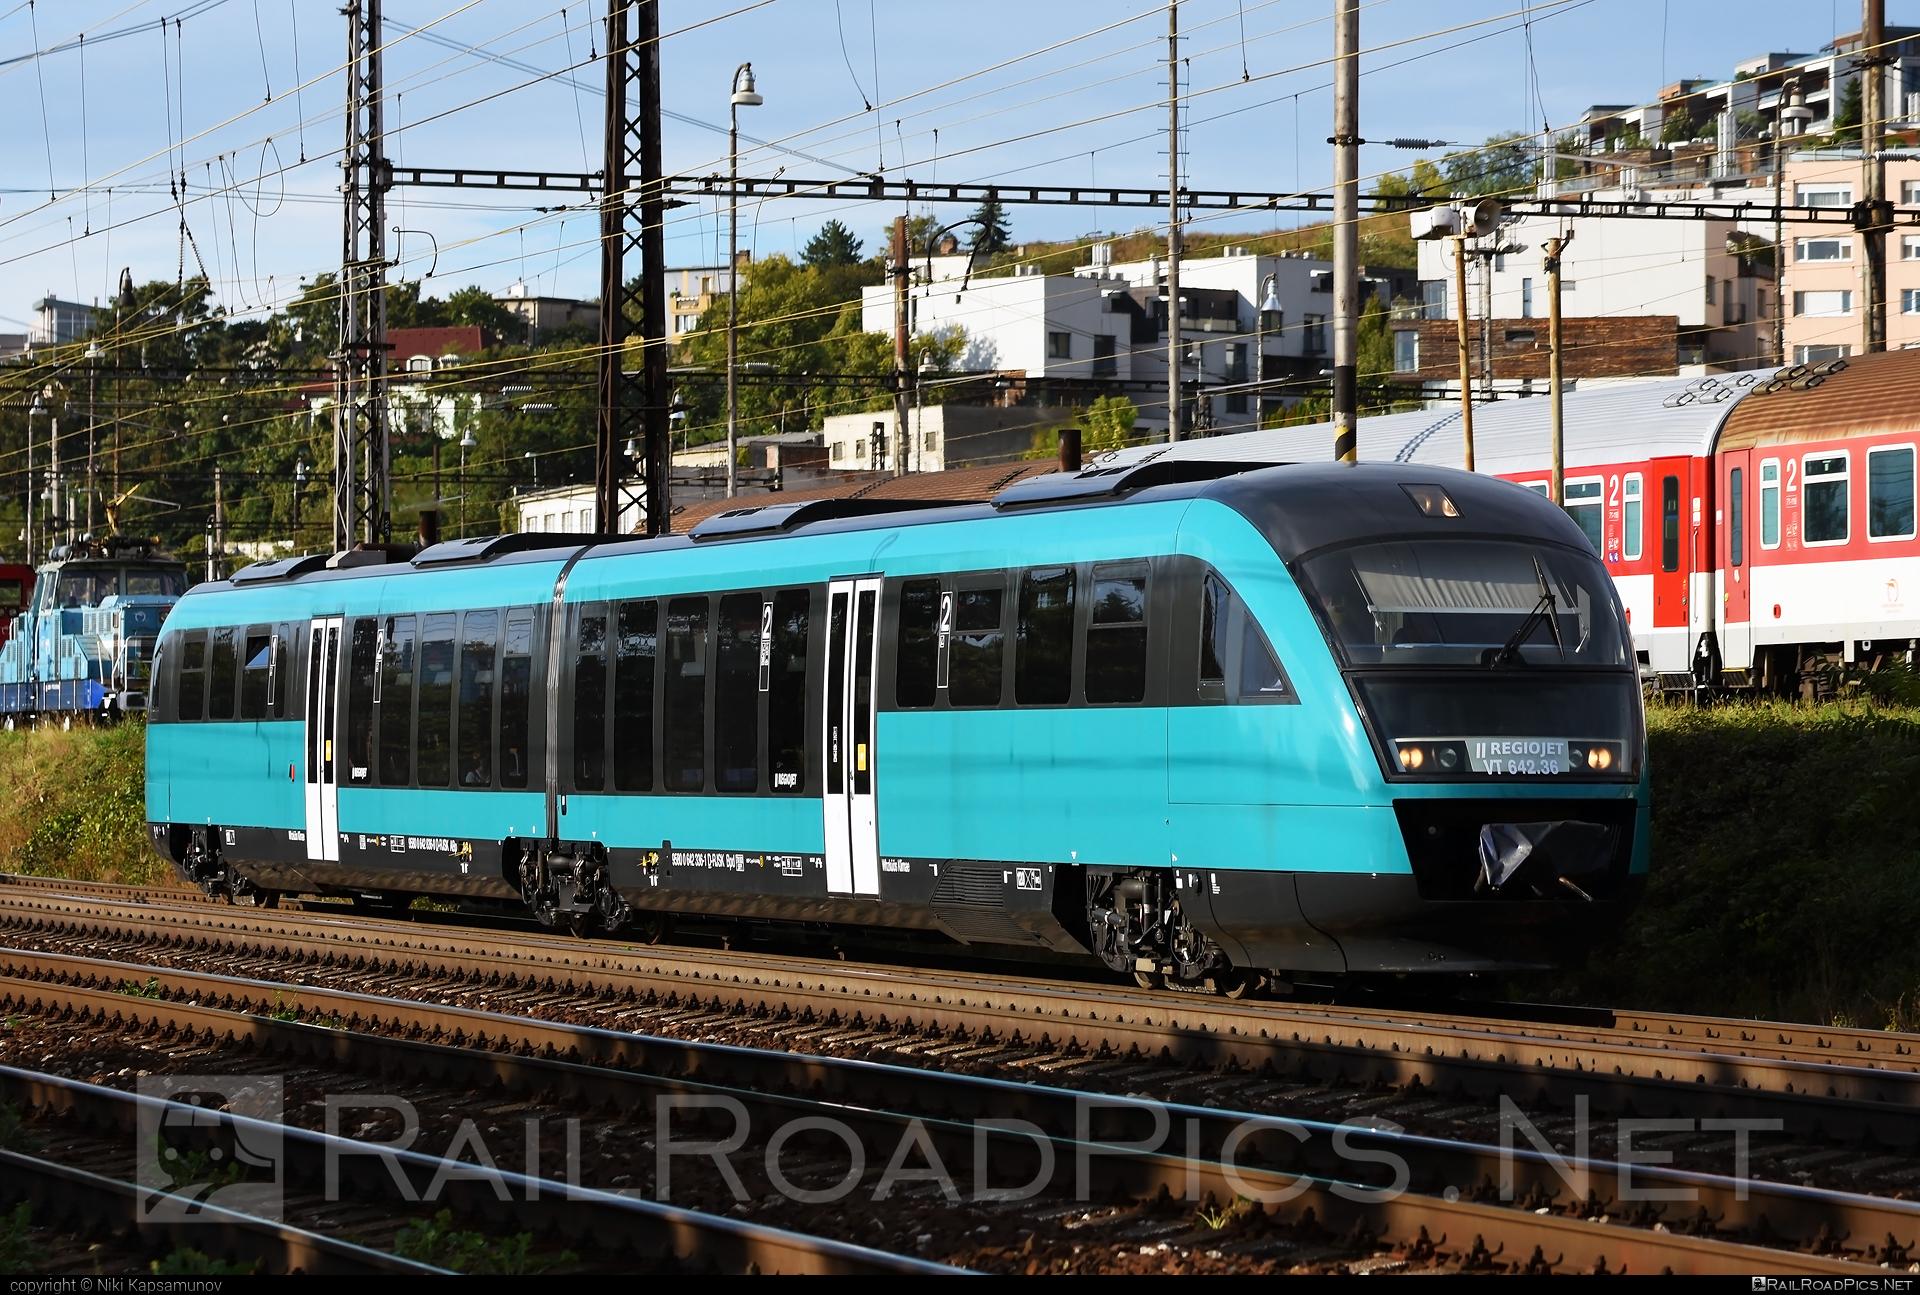 Siemens Desiro Classic - VT 642.36 operated by RegioJet a.s. #desiro #desiroclassic #regiojet #siemens #siemensdesiro #siemensdesiroclassic